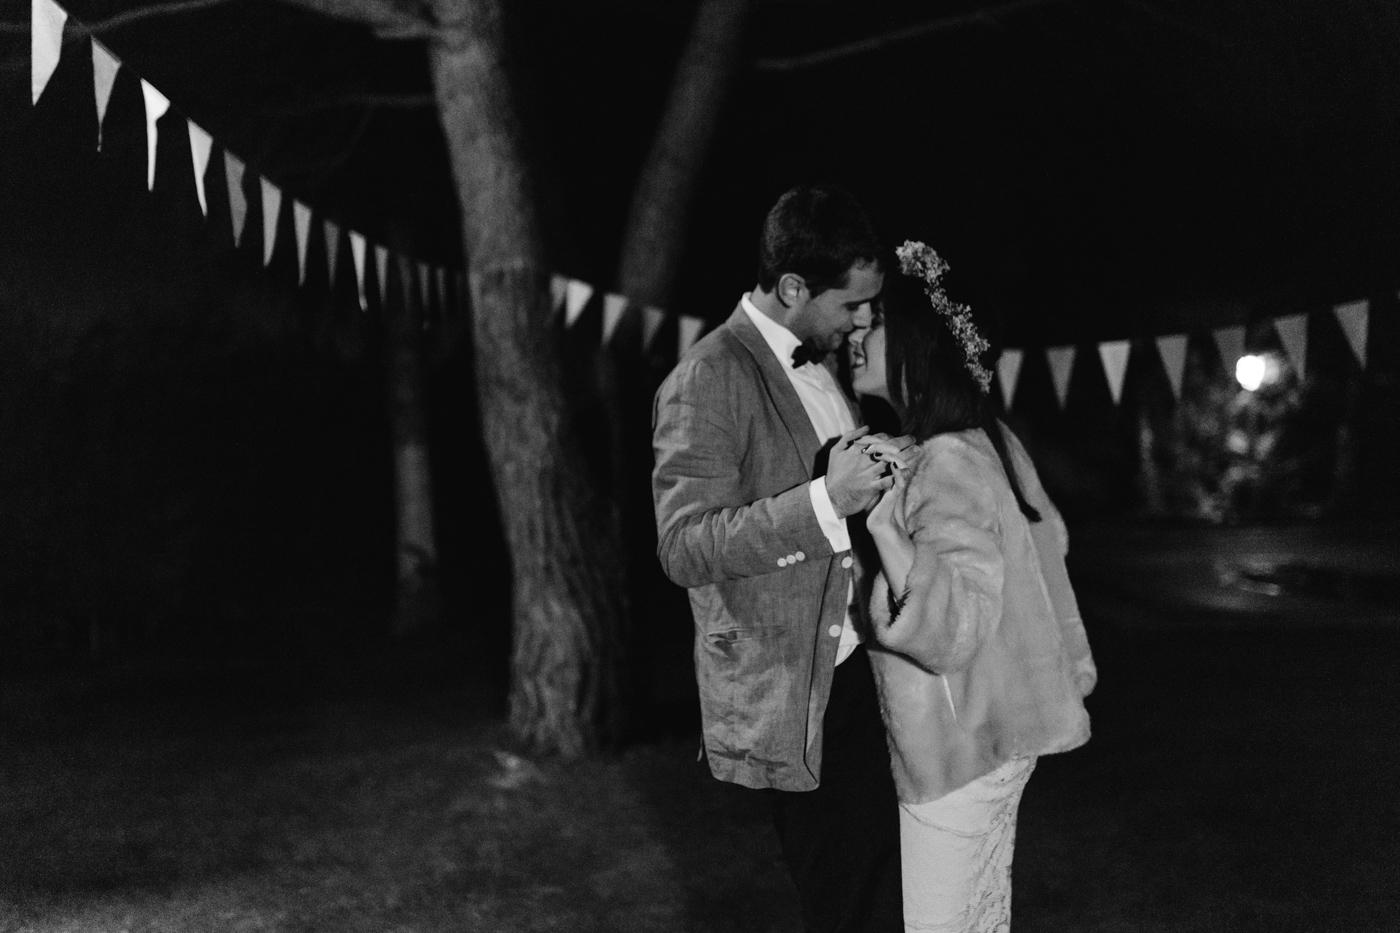 Velvet-Hush-fotografos-boda-al-aire-libre-madrid-117